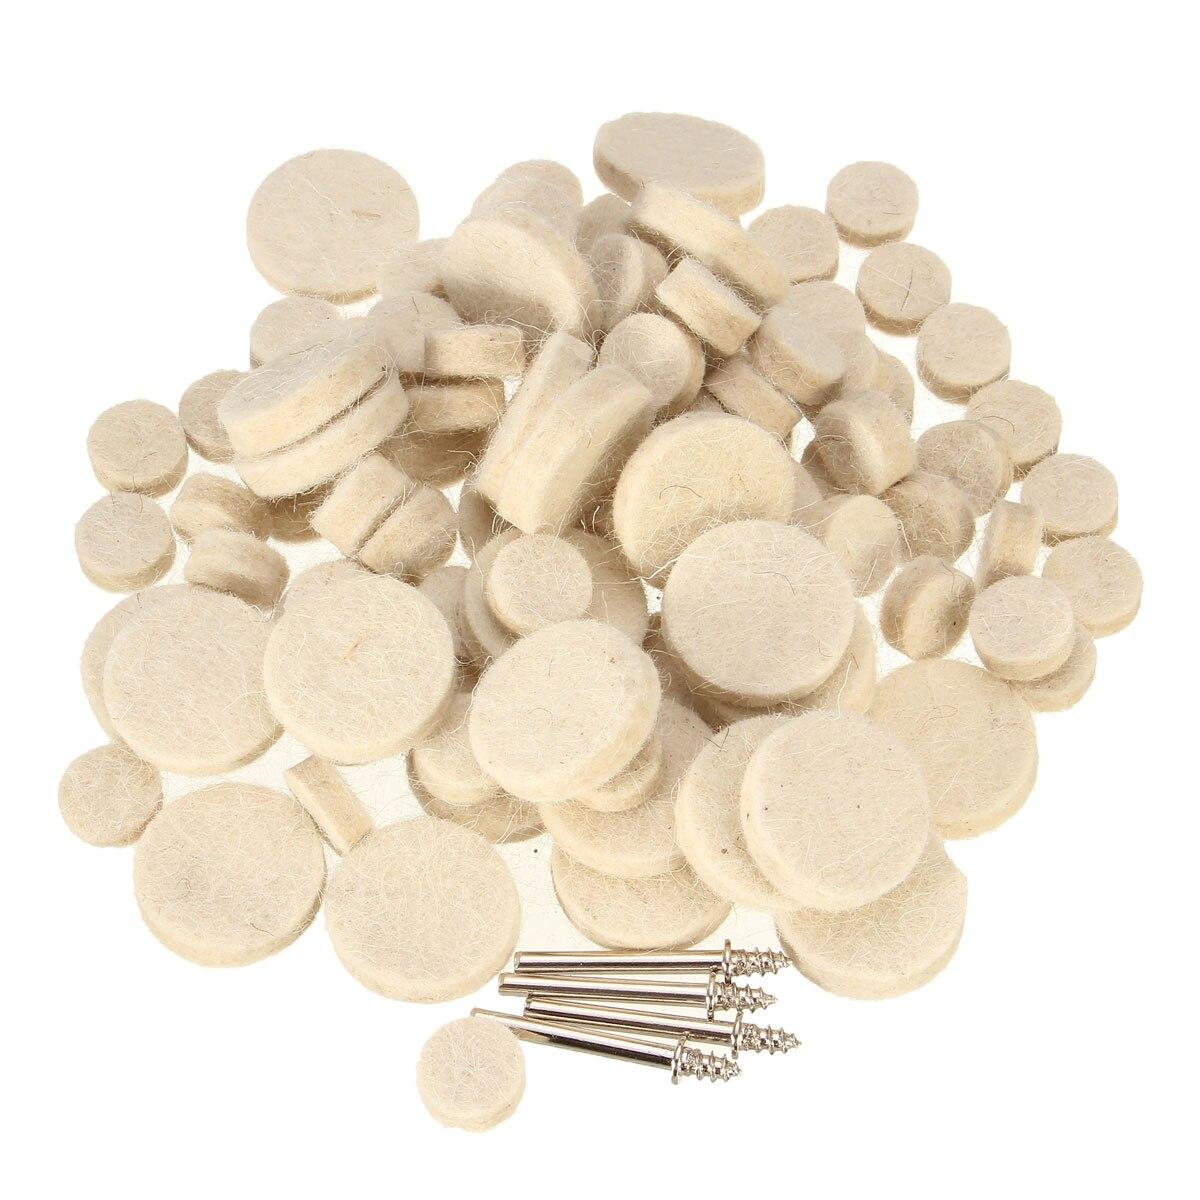 100pcs Polishing Pad Soft Felt Polishing Wheel Set With Mandrels For Dremel Rotary Tools Smooth Soft Polishing Buffer Kit